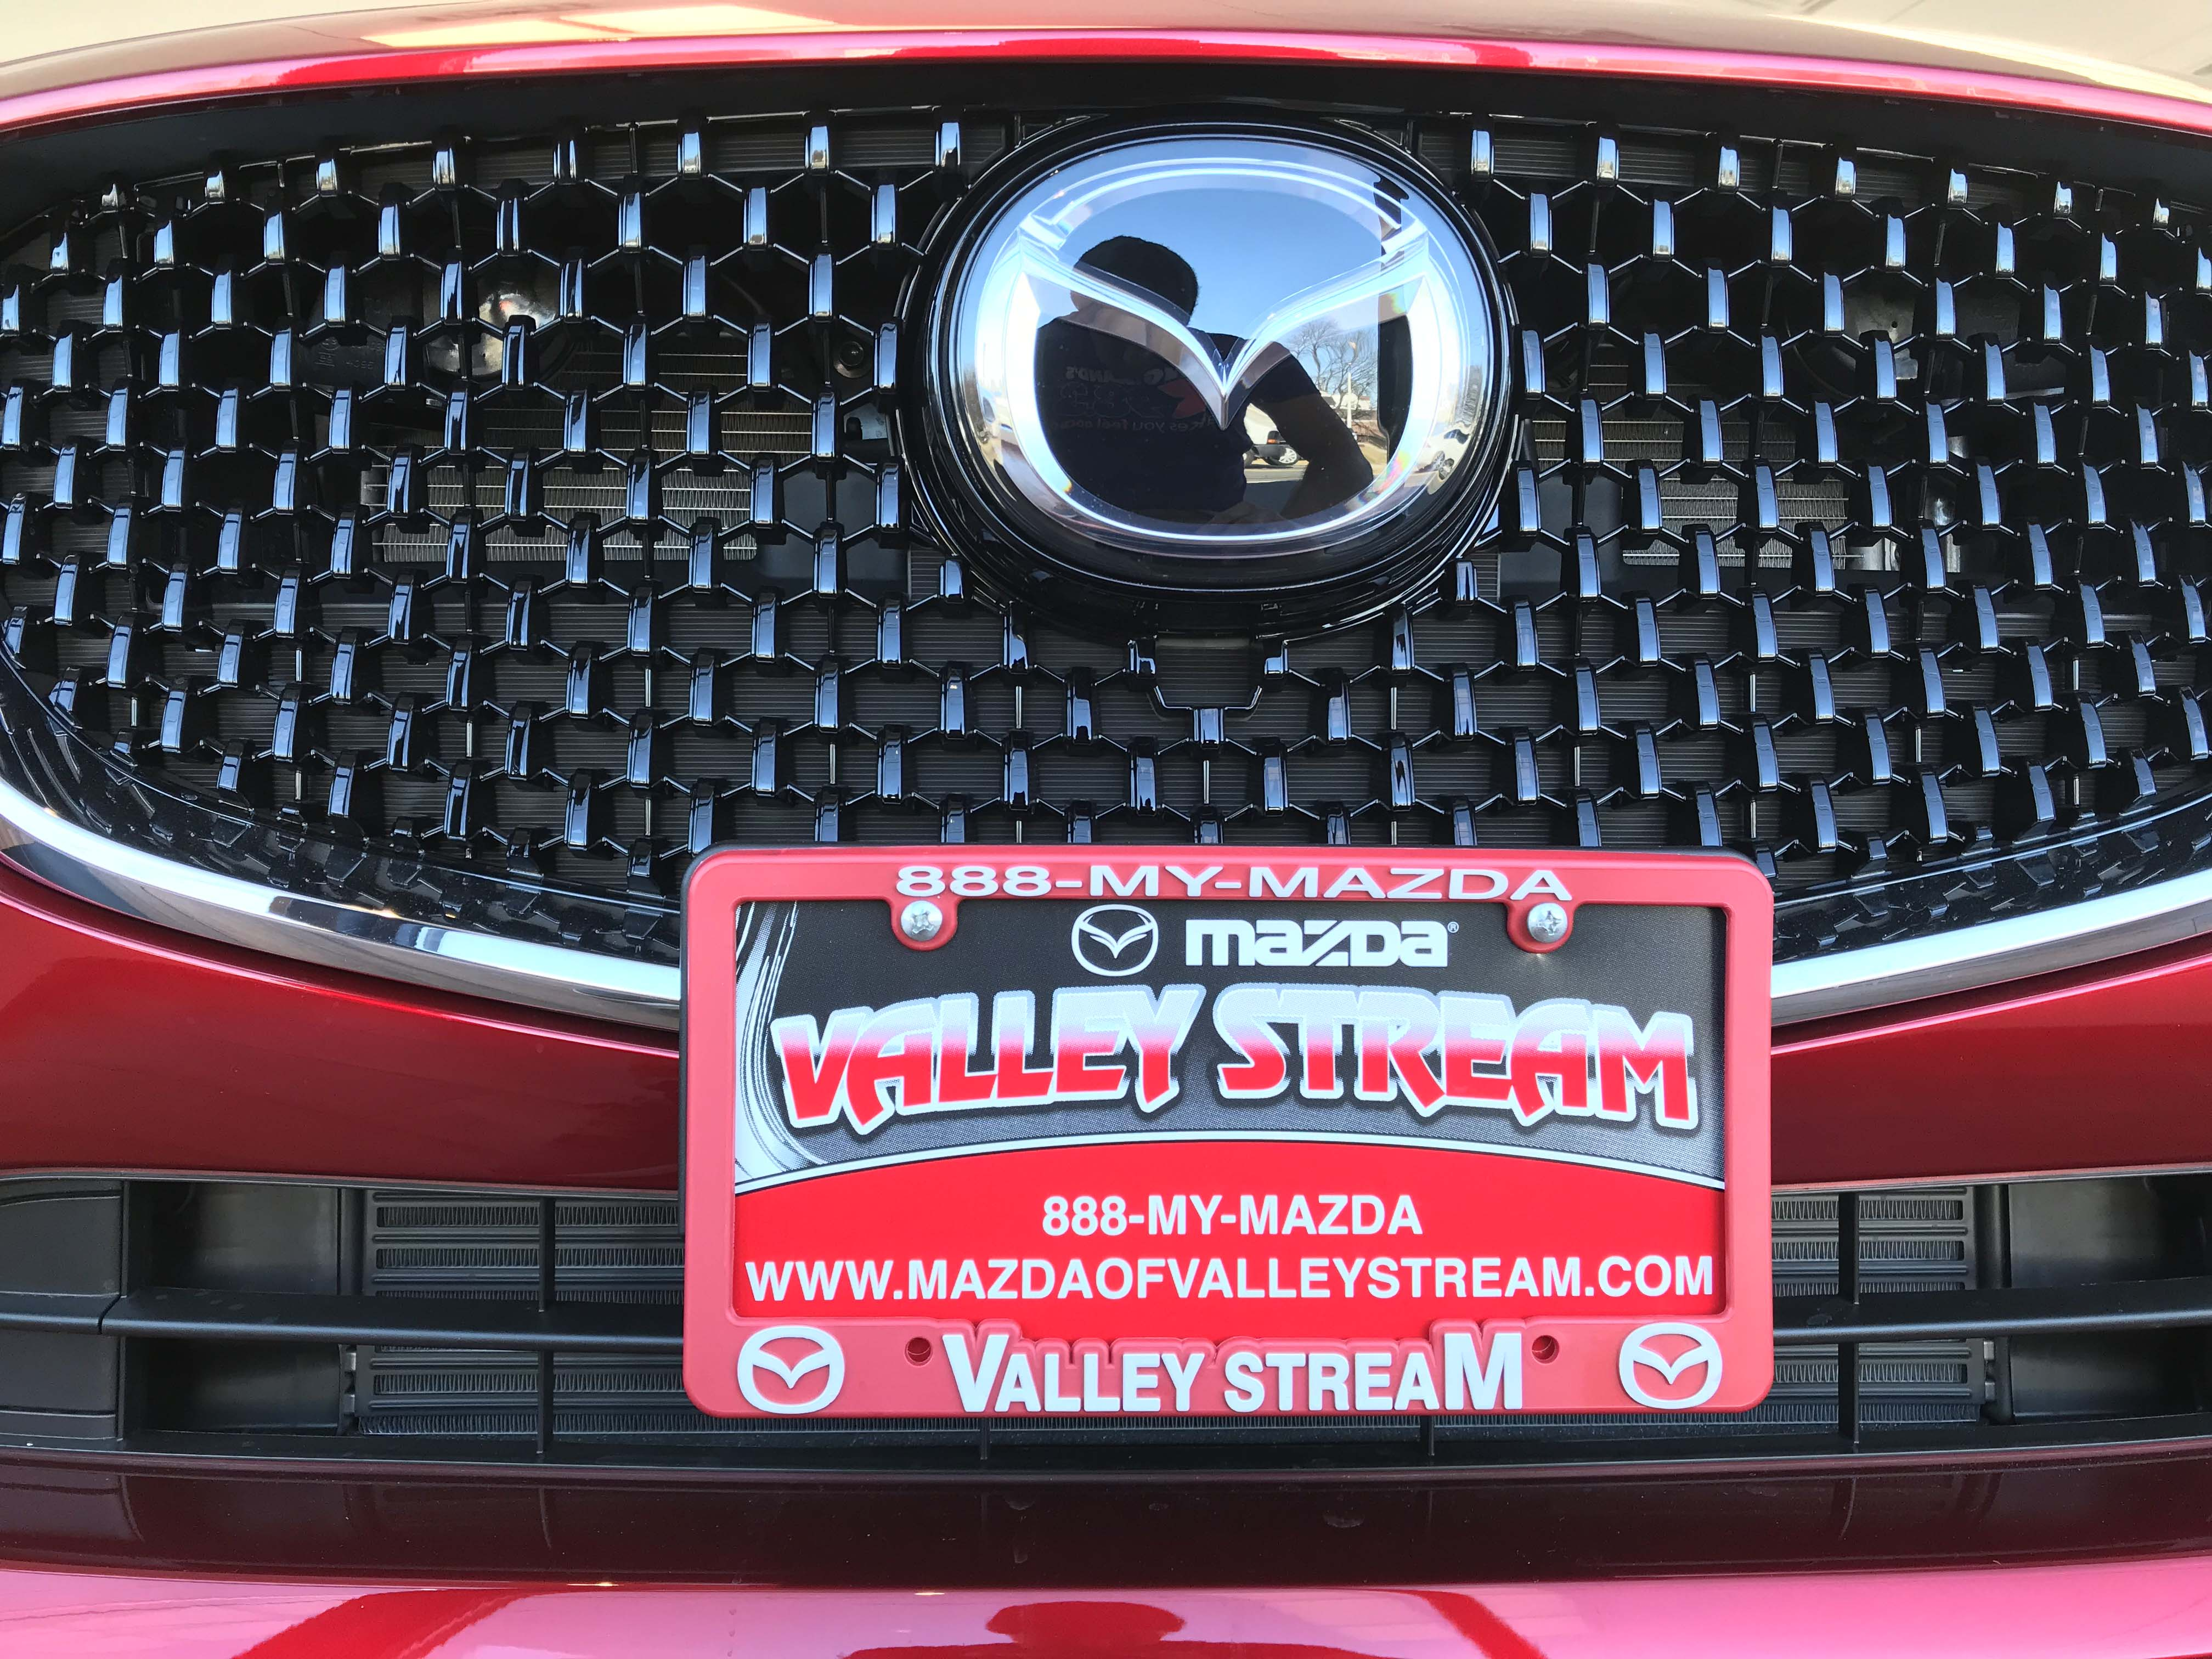 Jon Daniels @ Mazda of Valley Stream